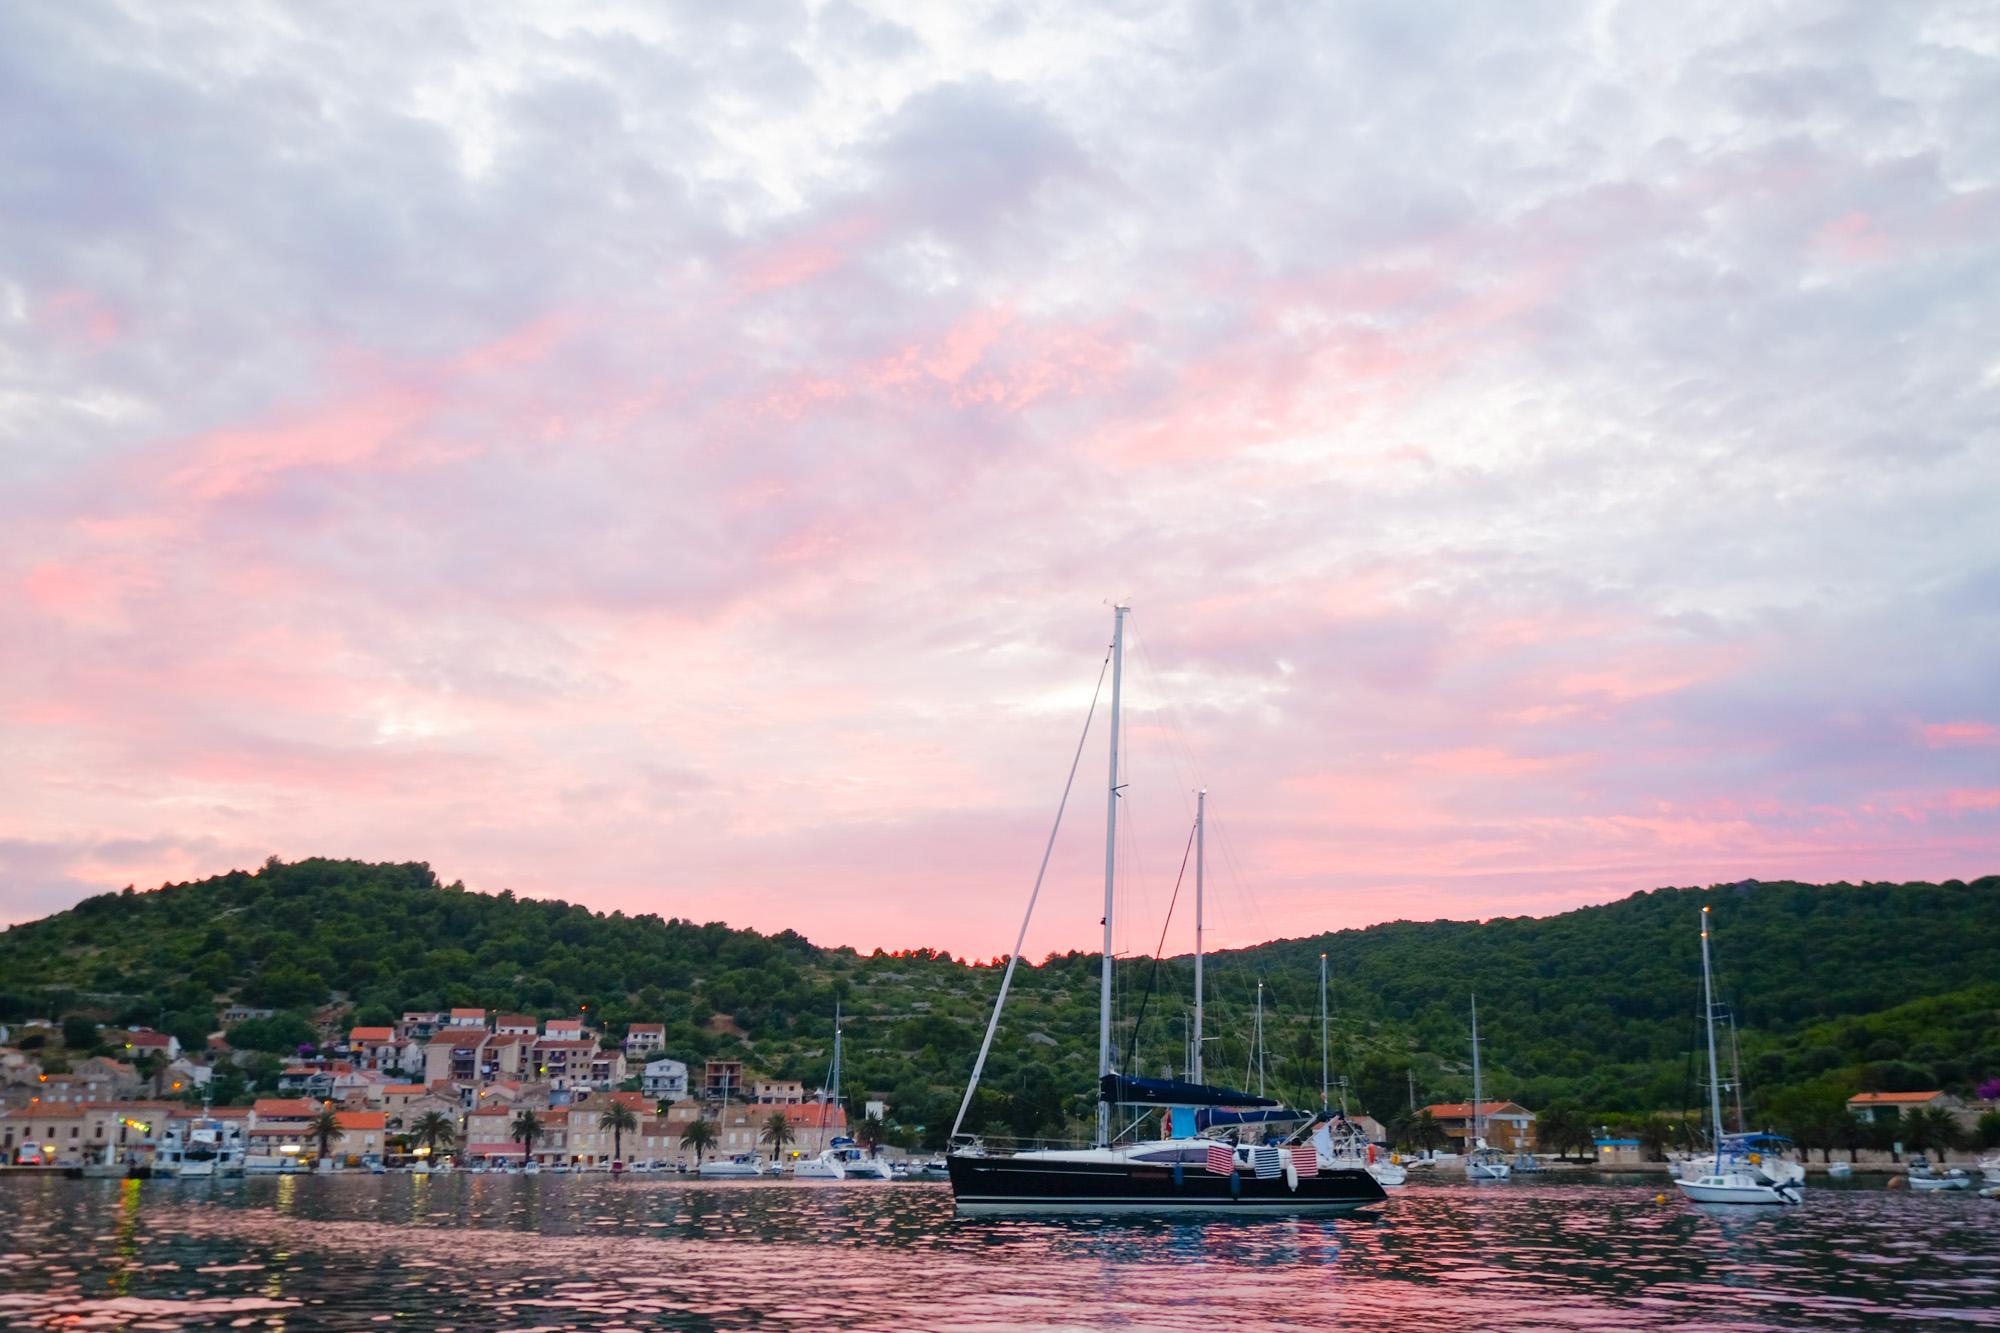 Sunset Sailing in Croatia